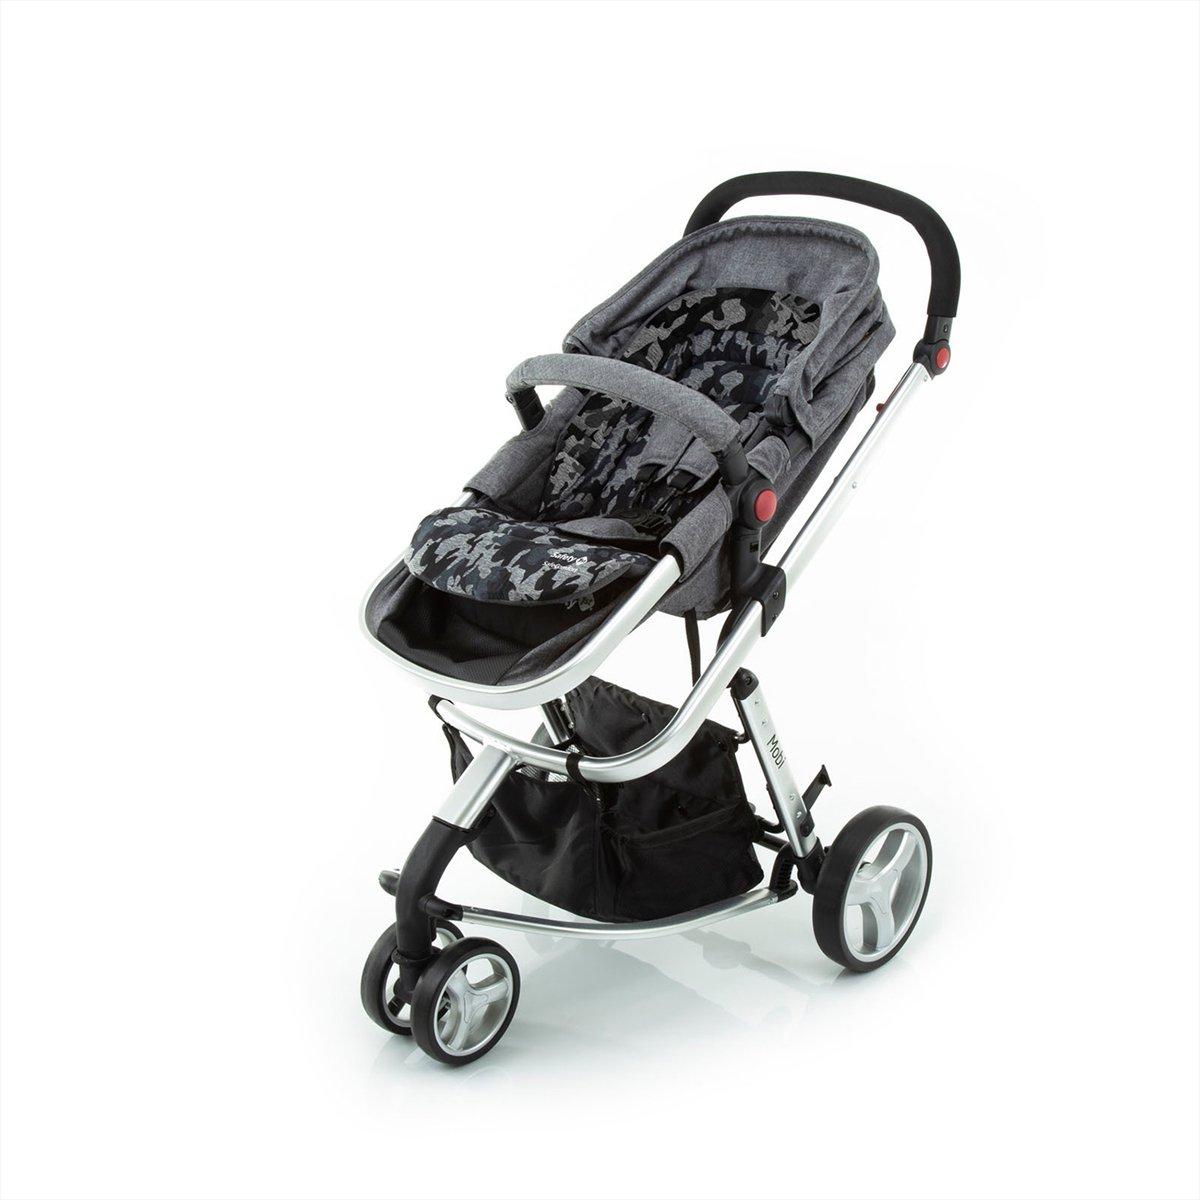 Almofada para Carrinhos - Safe Comfort - Grey Army - Safety 1st